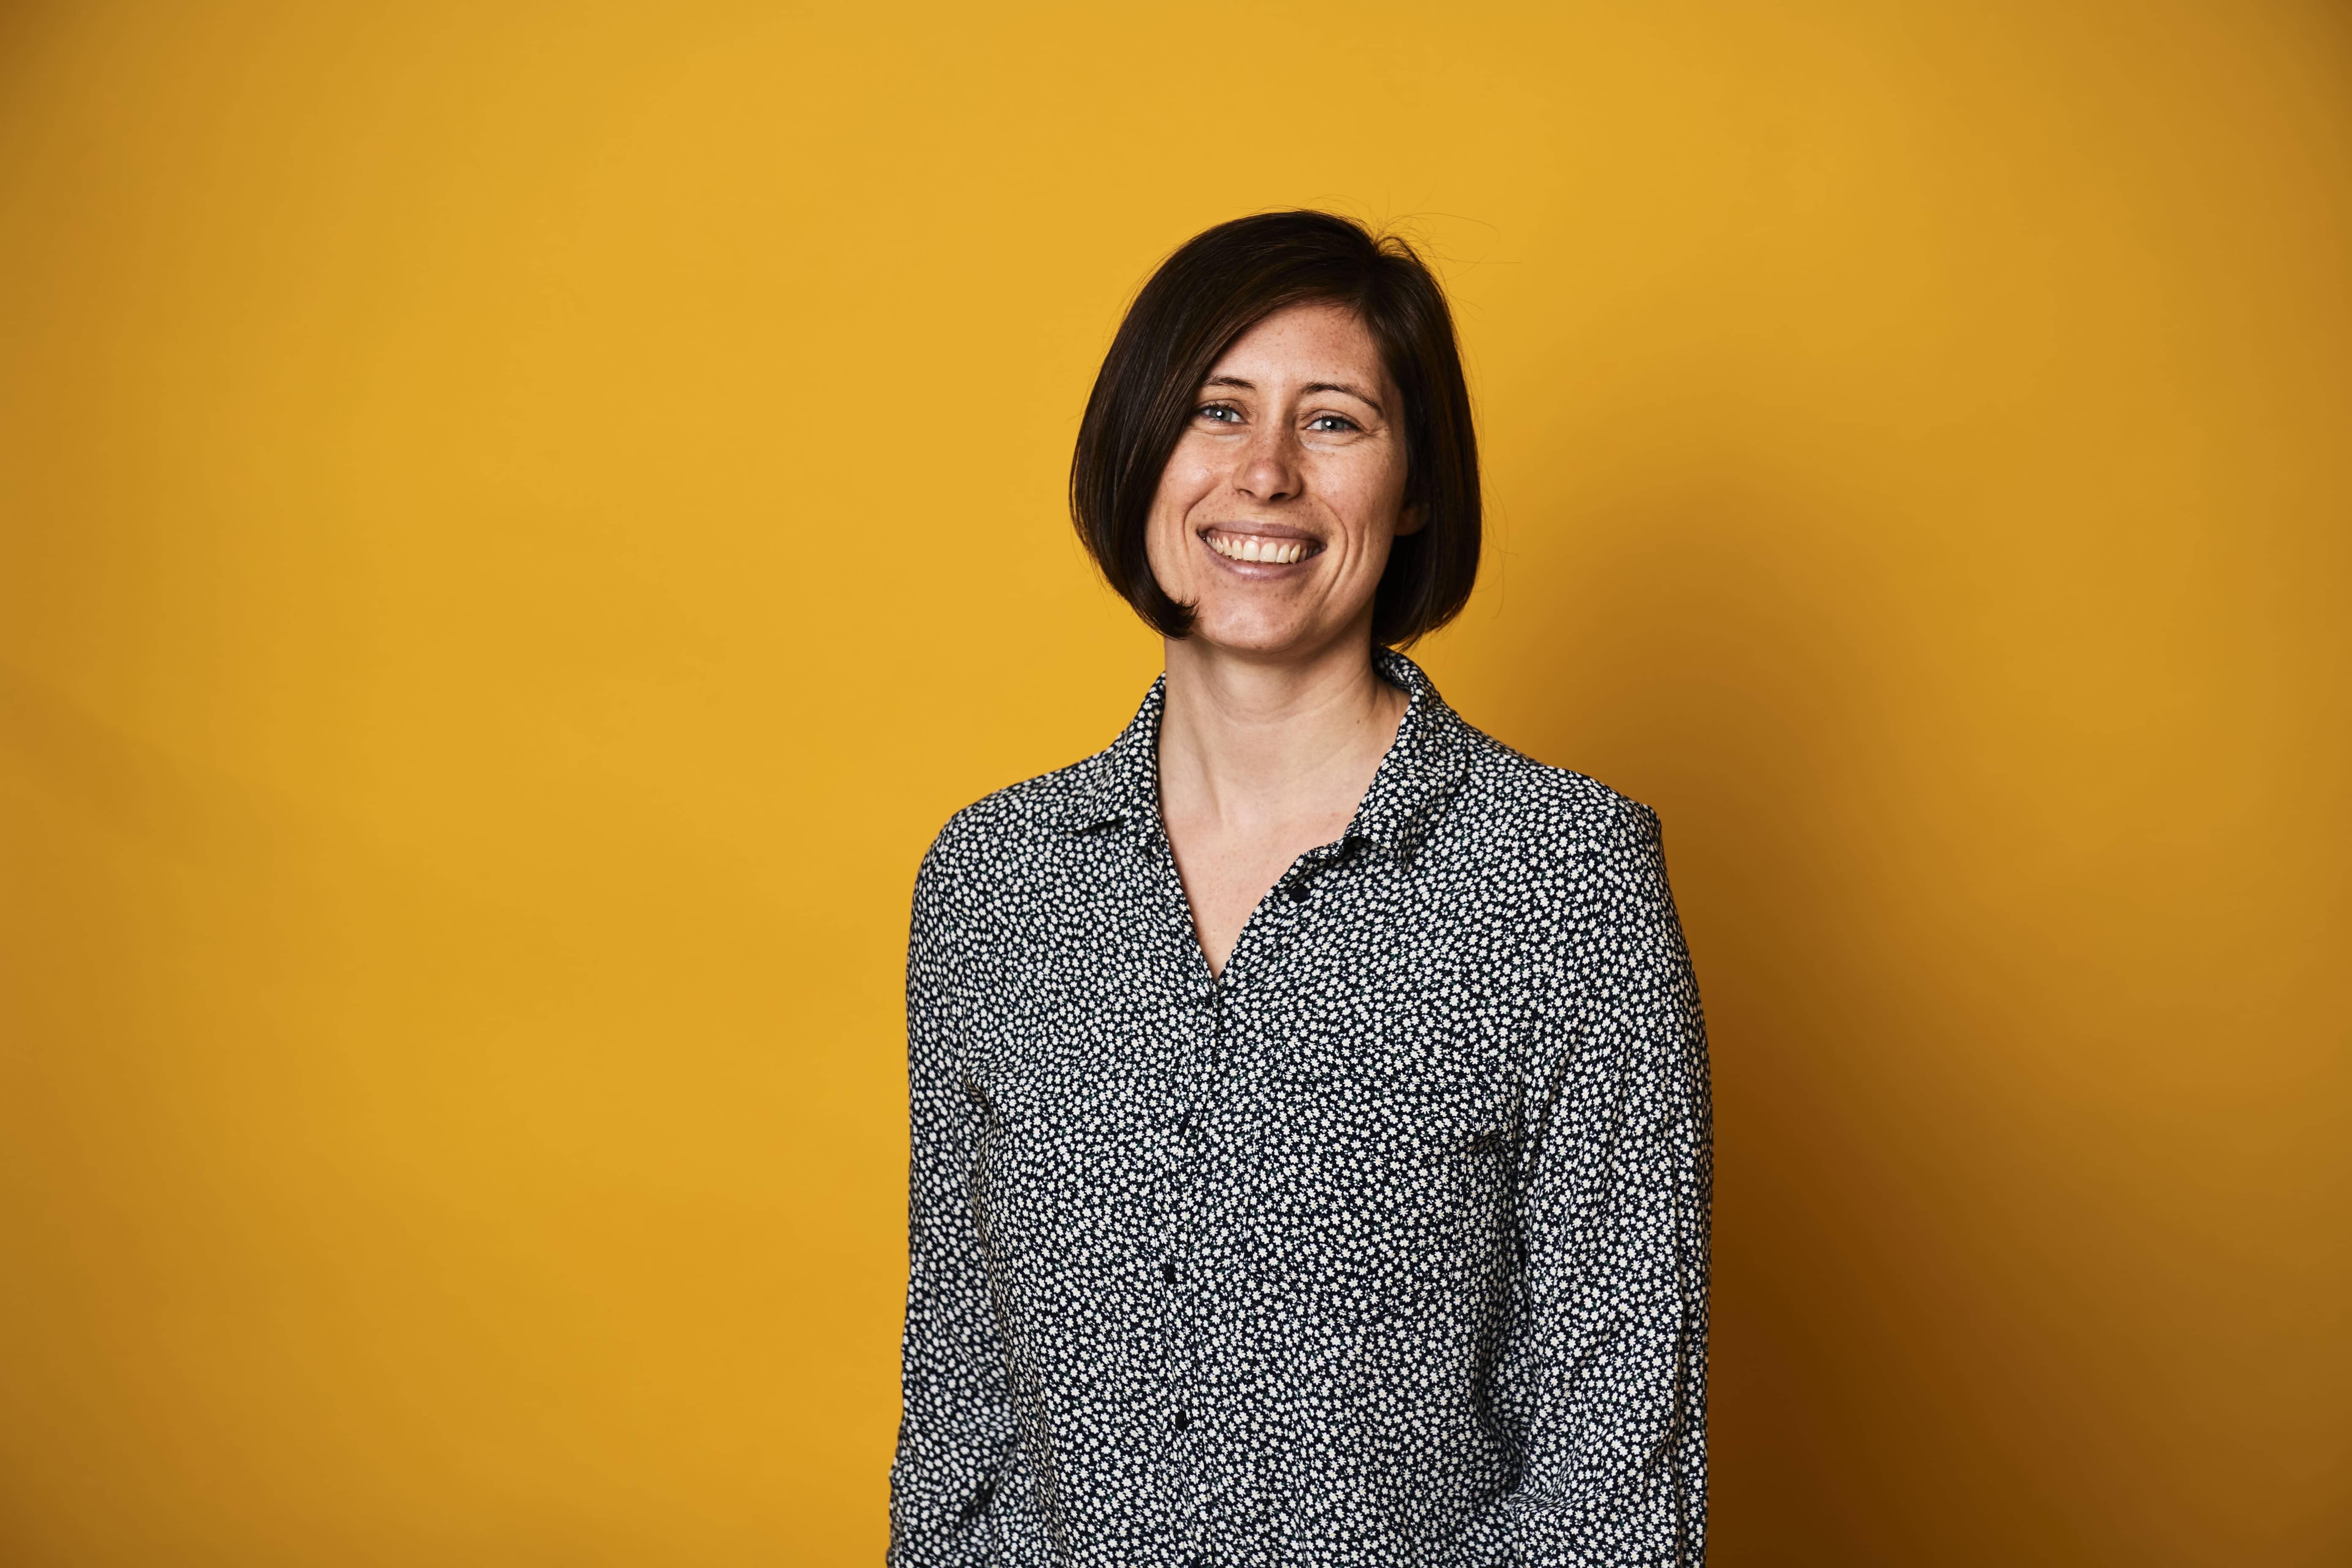 Johanna Seeliger, Founder and Managing Director